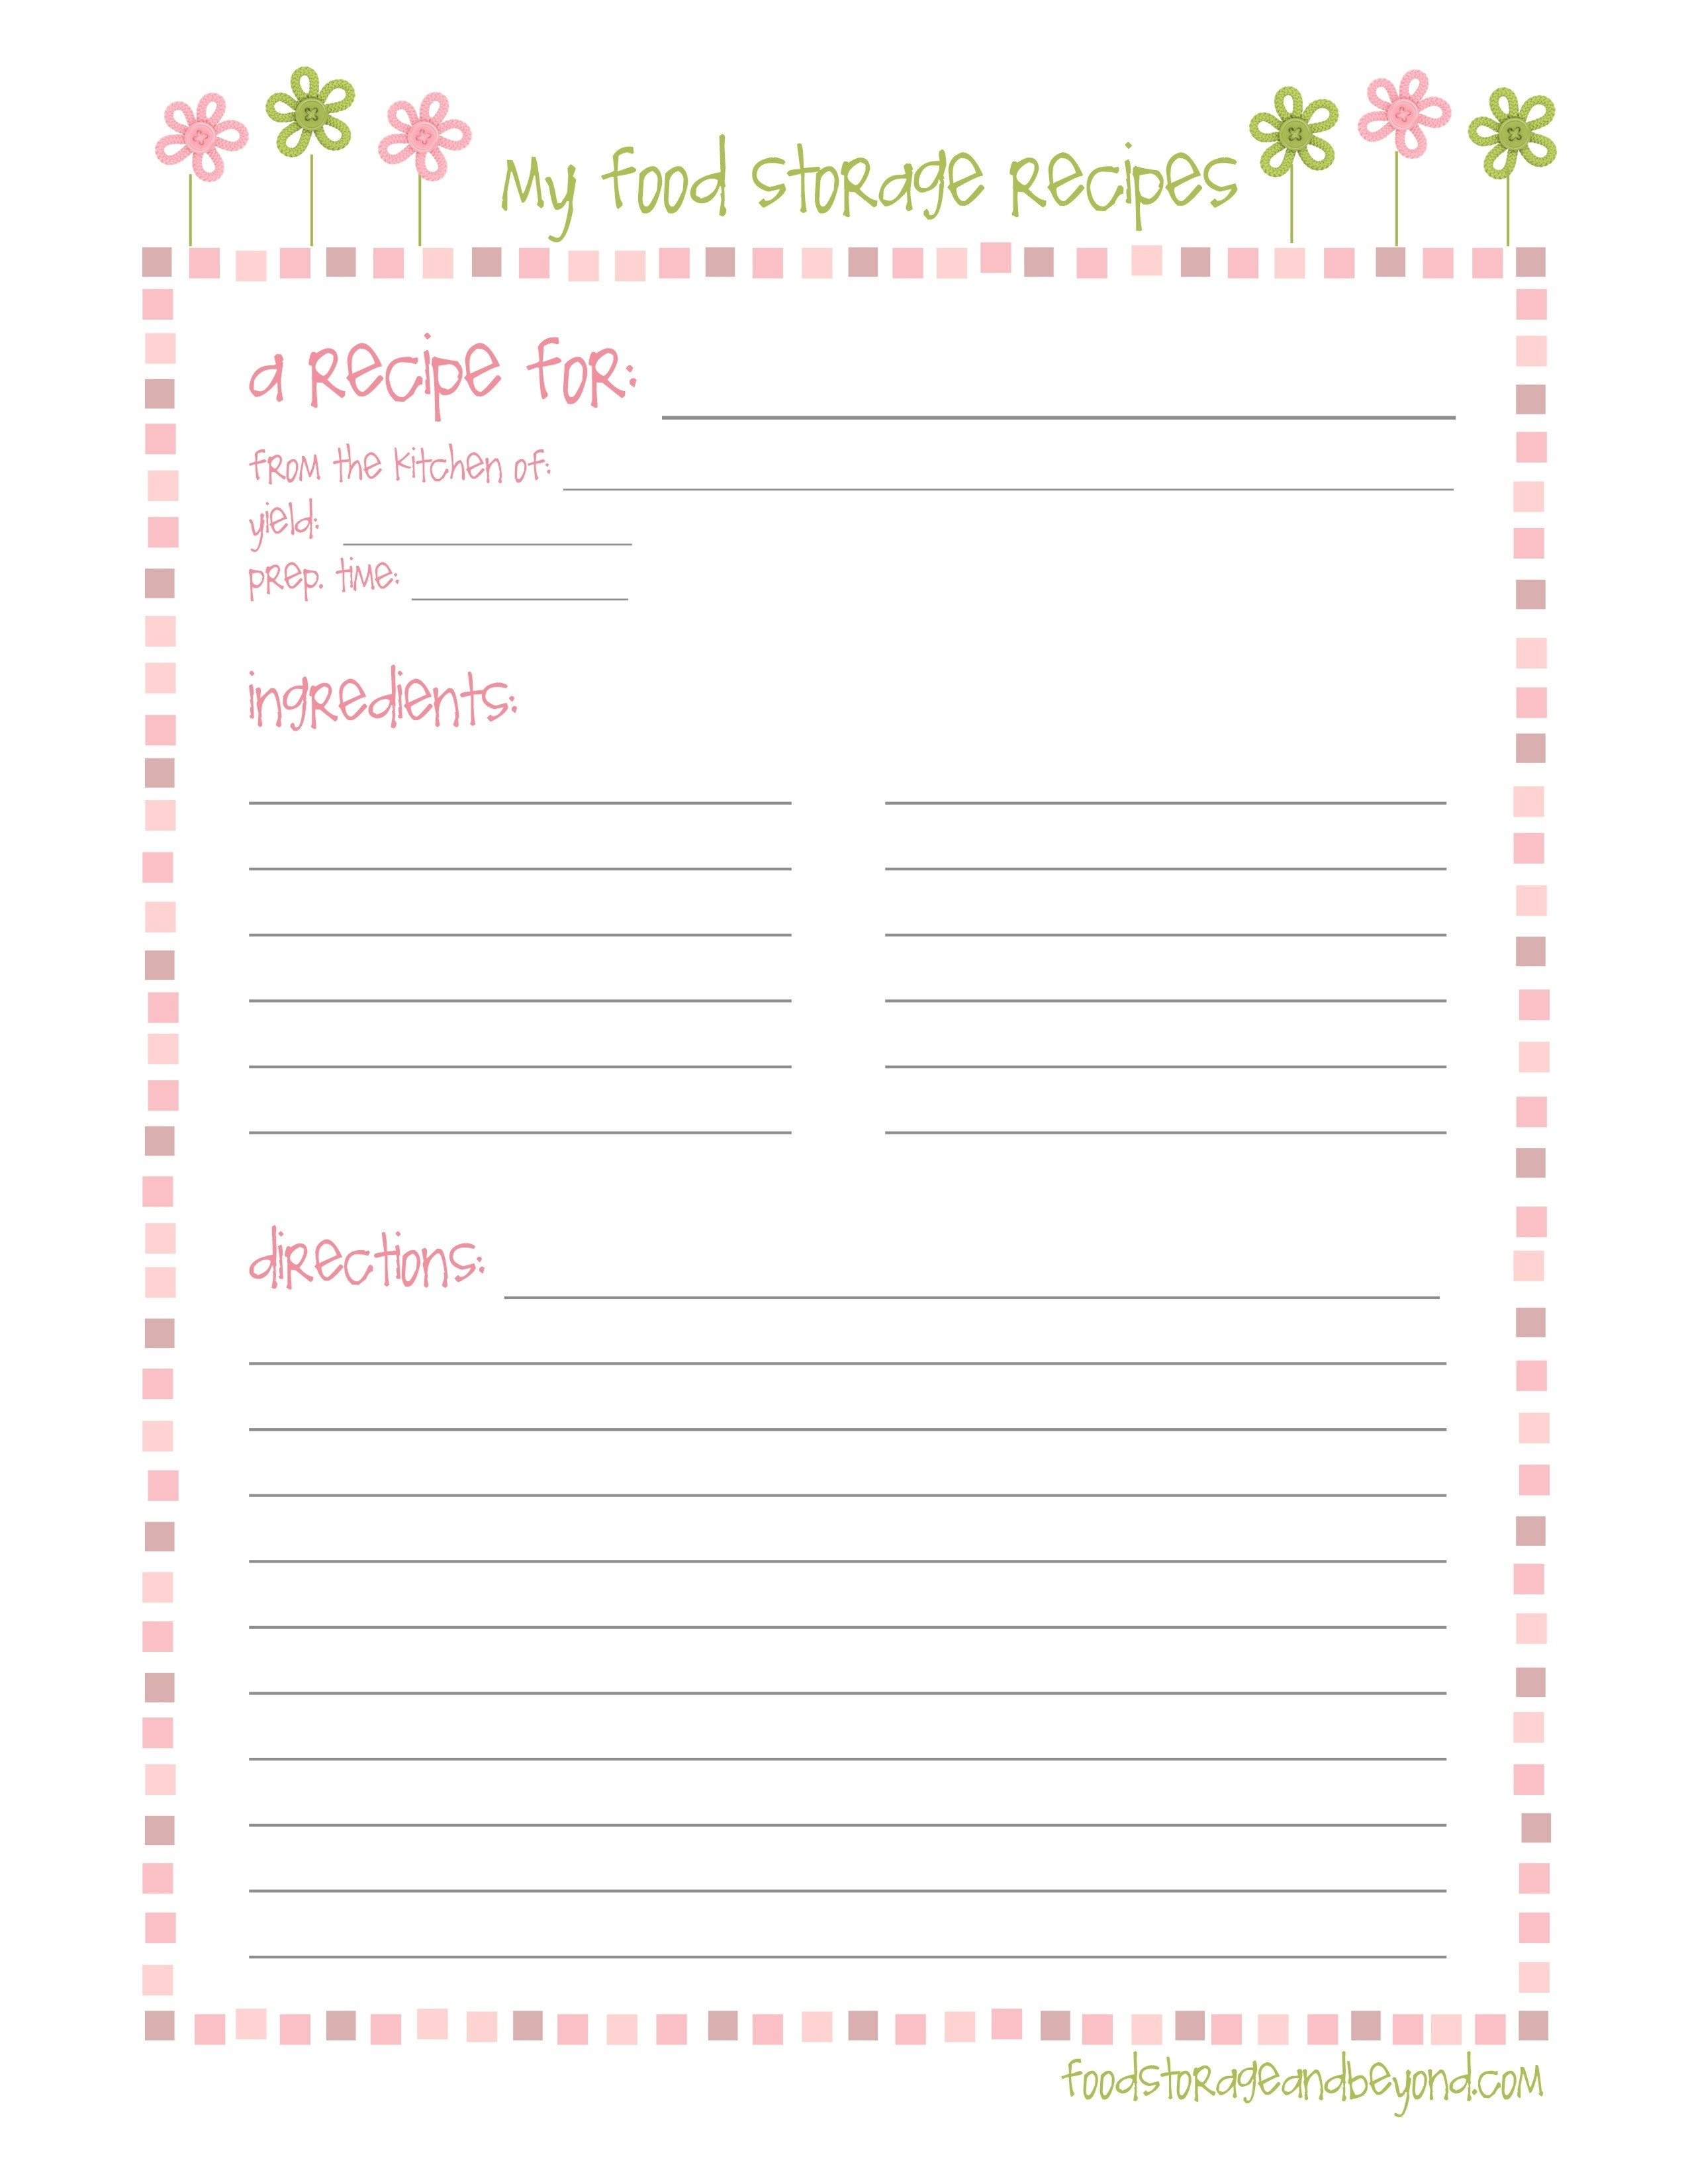 Free Printable Recipe Templates 8X11 | Lazine - Free Printable Recipe Page Template